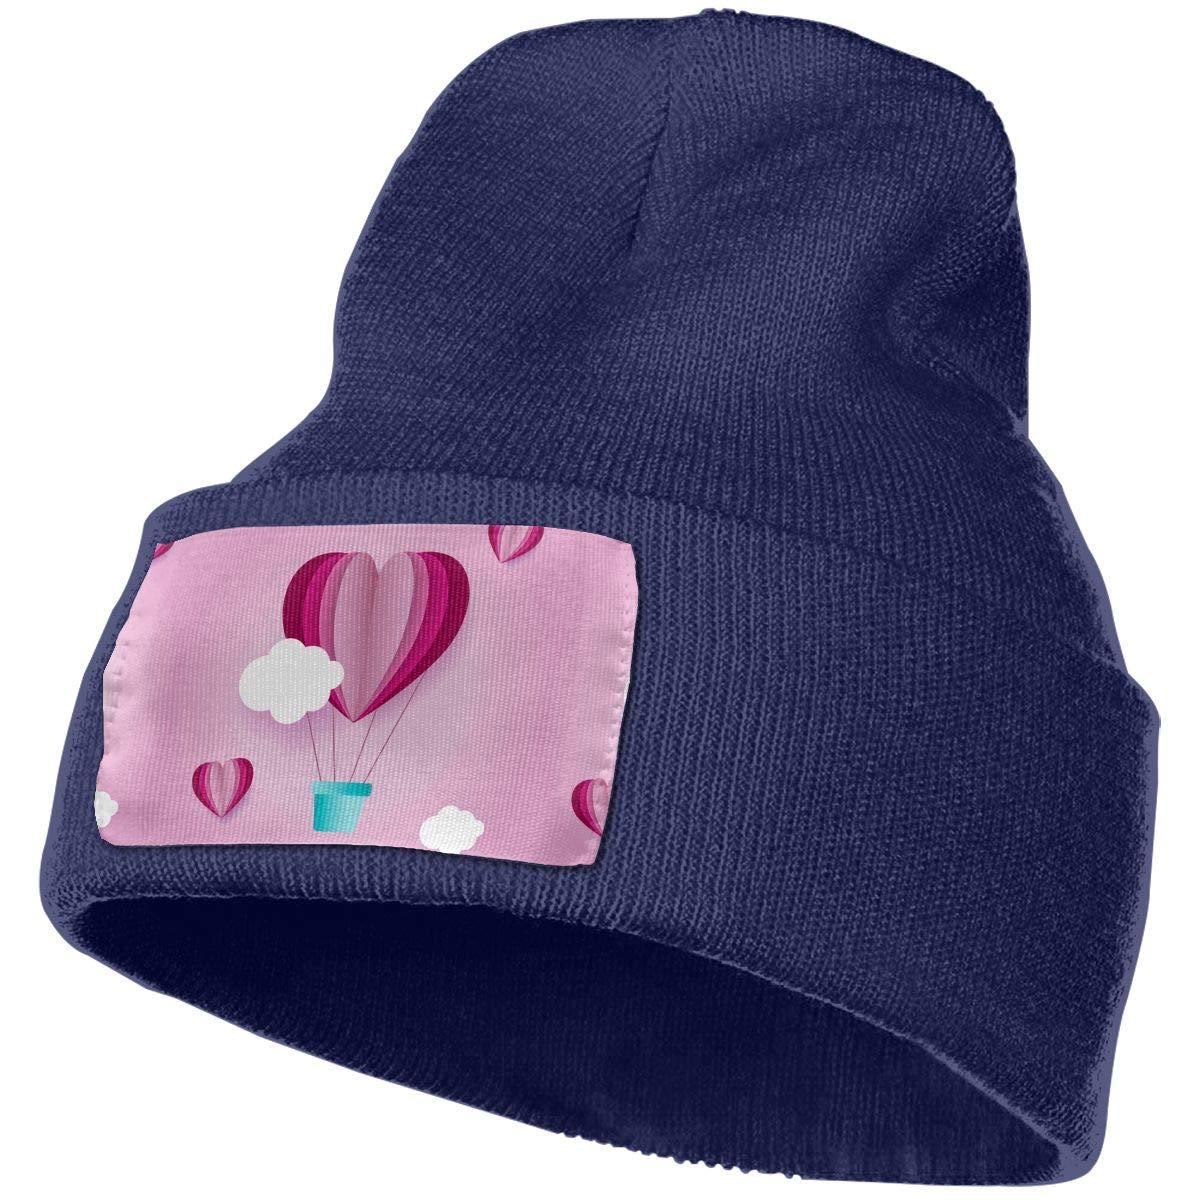 Love Hot Air Balloon Unisex Fashion Knitted Hat Luxury Hip-Hop Cap